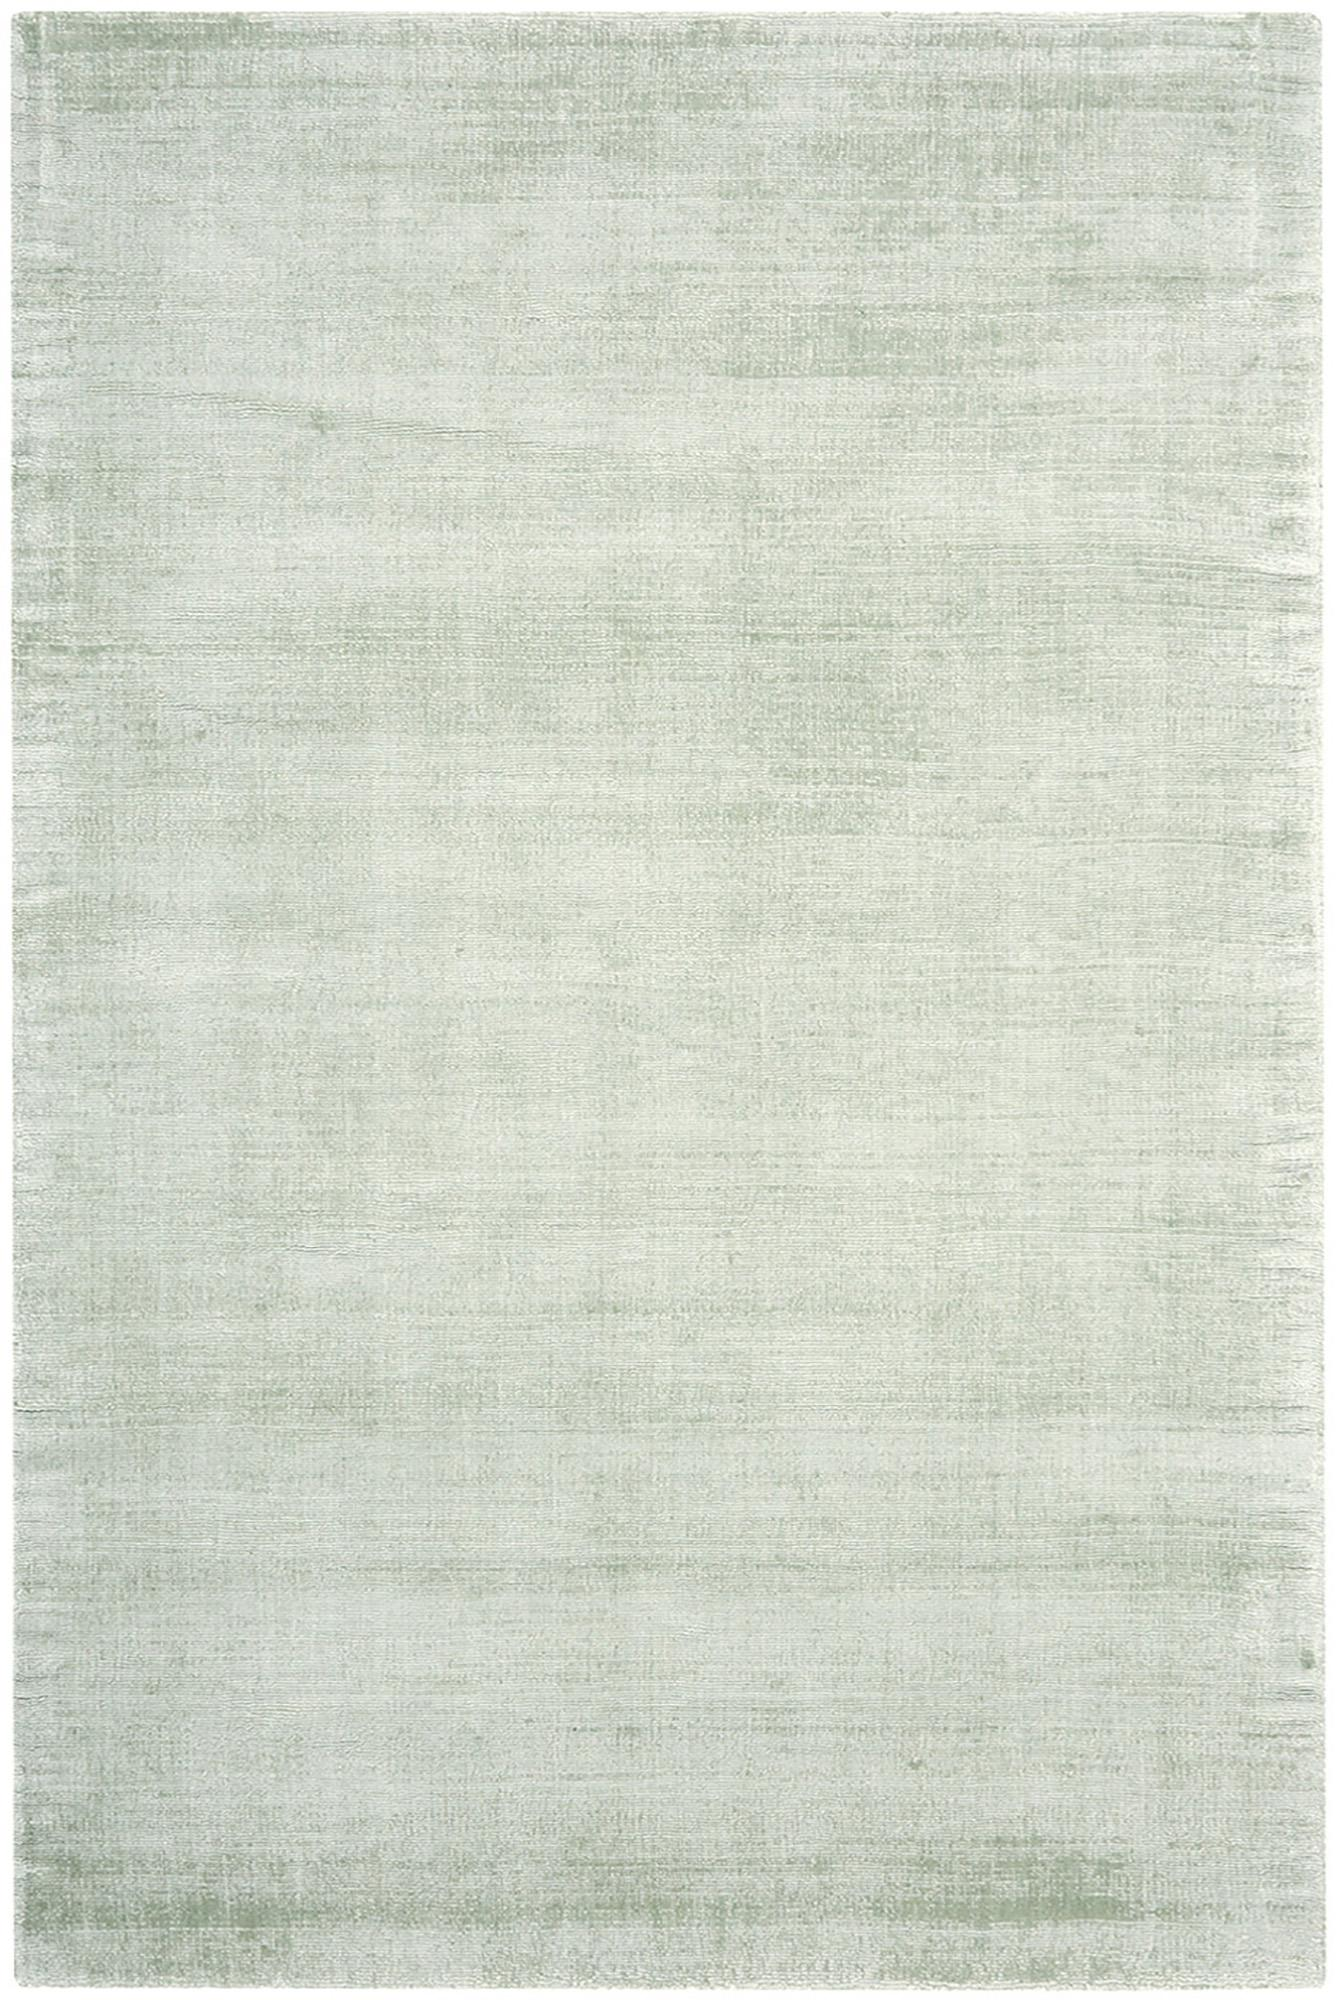 Handgewebter Viskoseteppich Jane in Lindgrün, Flor: 100% Viskose, Lindgrün, B 160 x L 230 cm (Größe M)